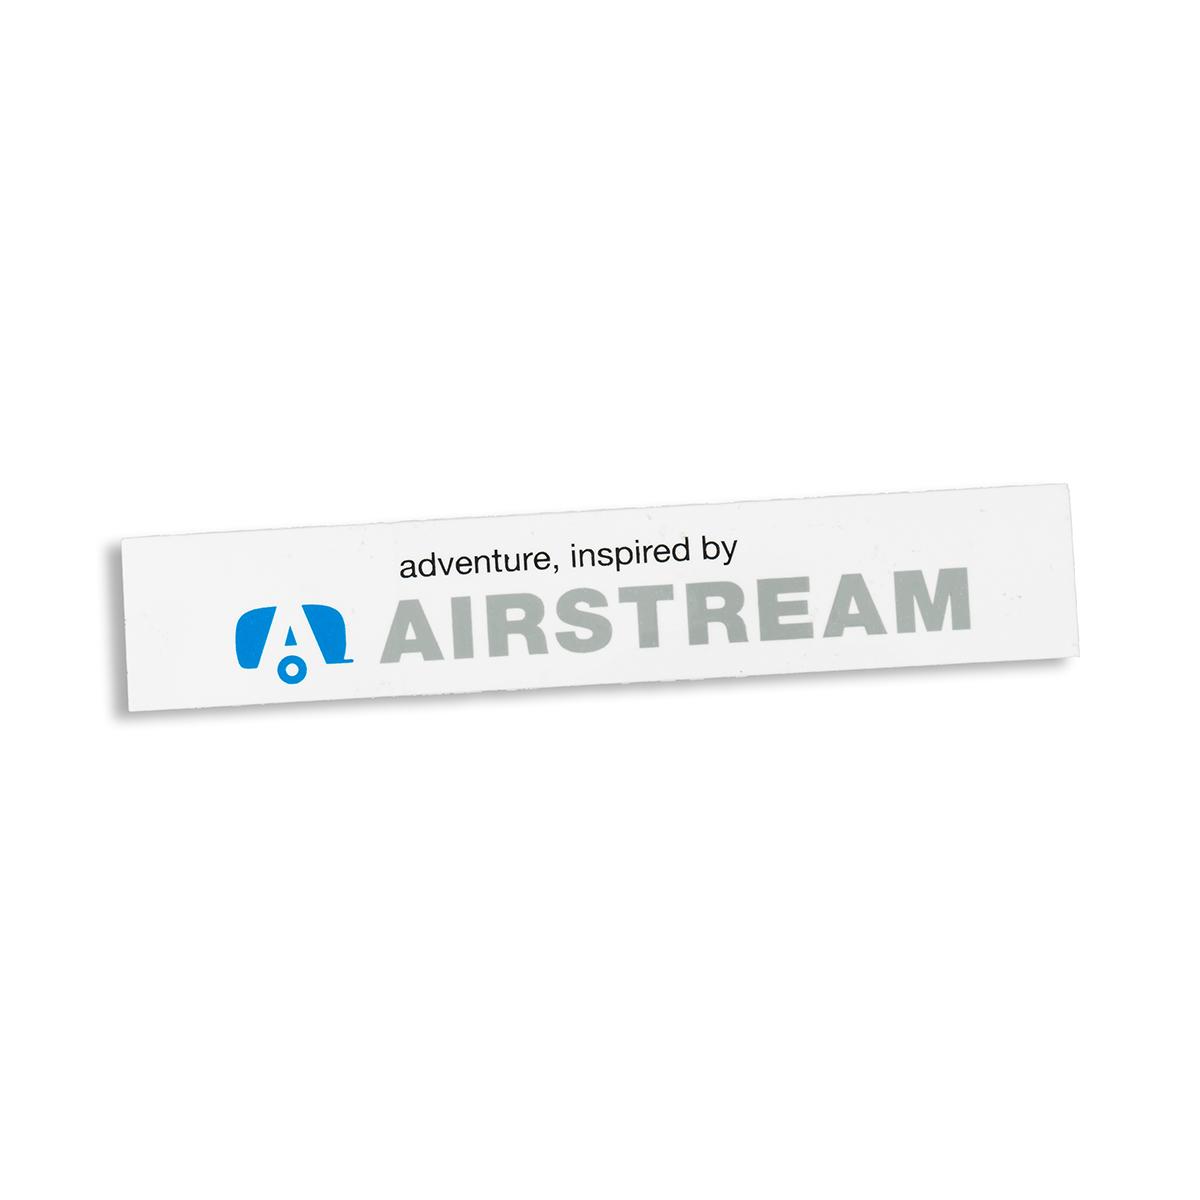 AIRMKT eCom PN XXXXXX _51430 Bumper Sticker Full Logo WEB